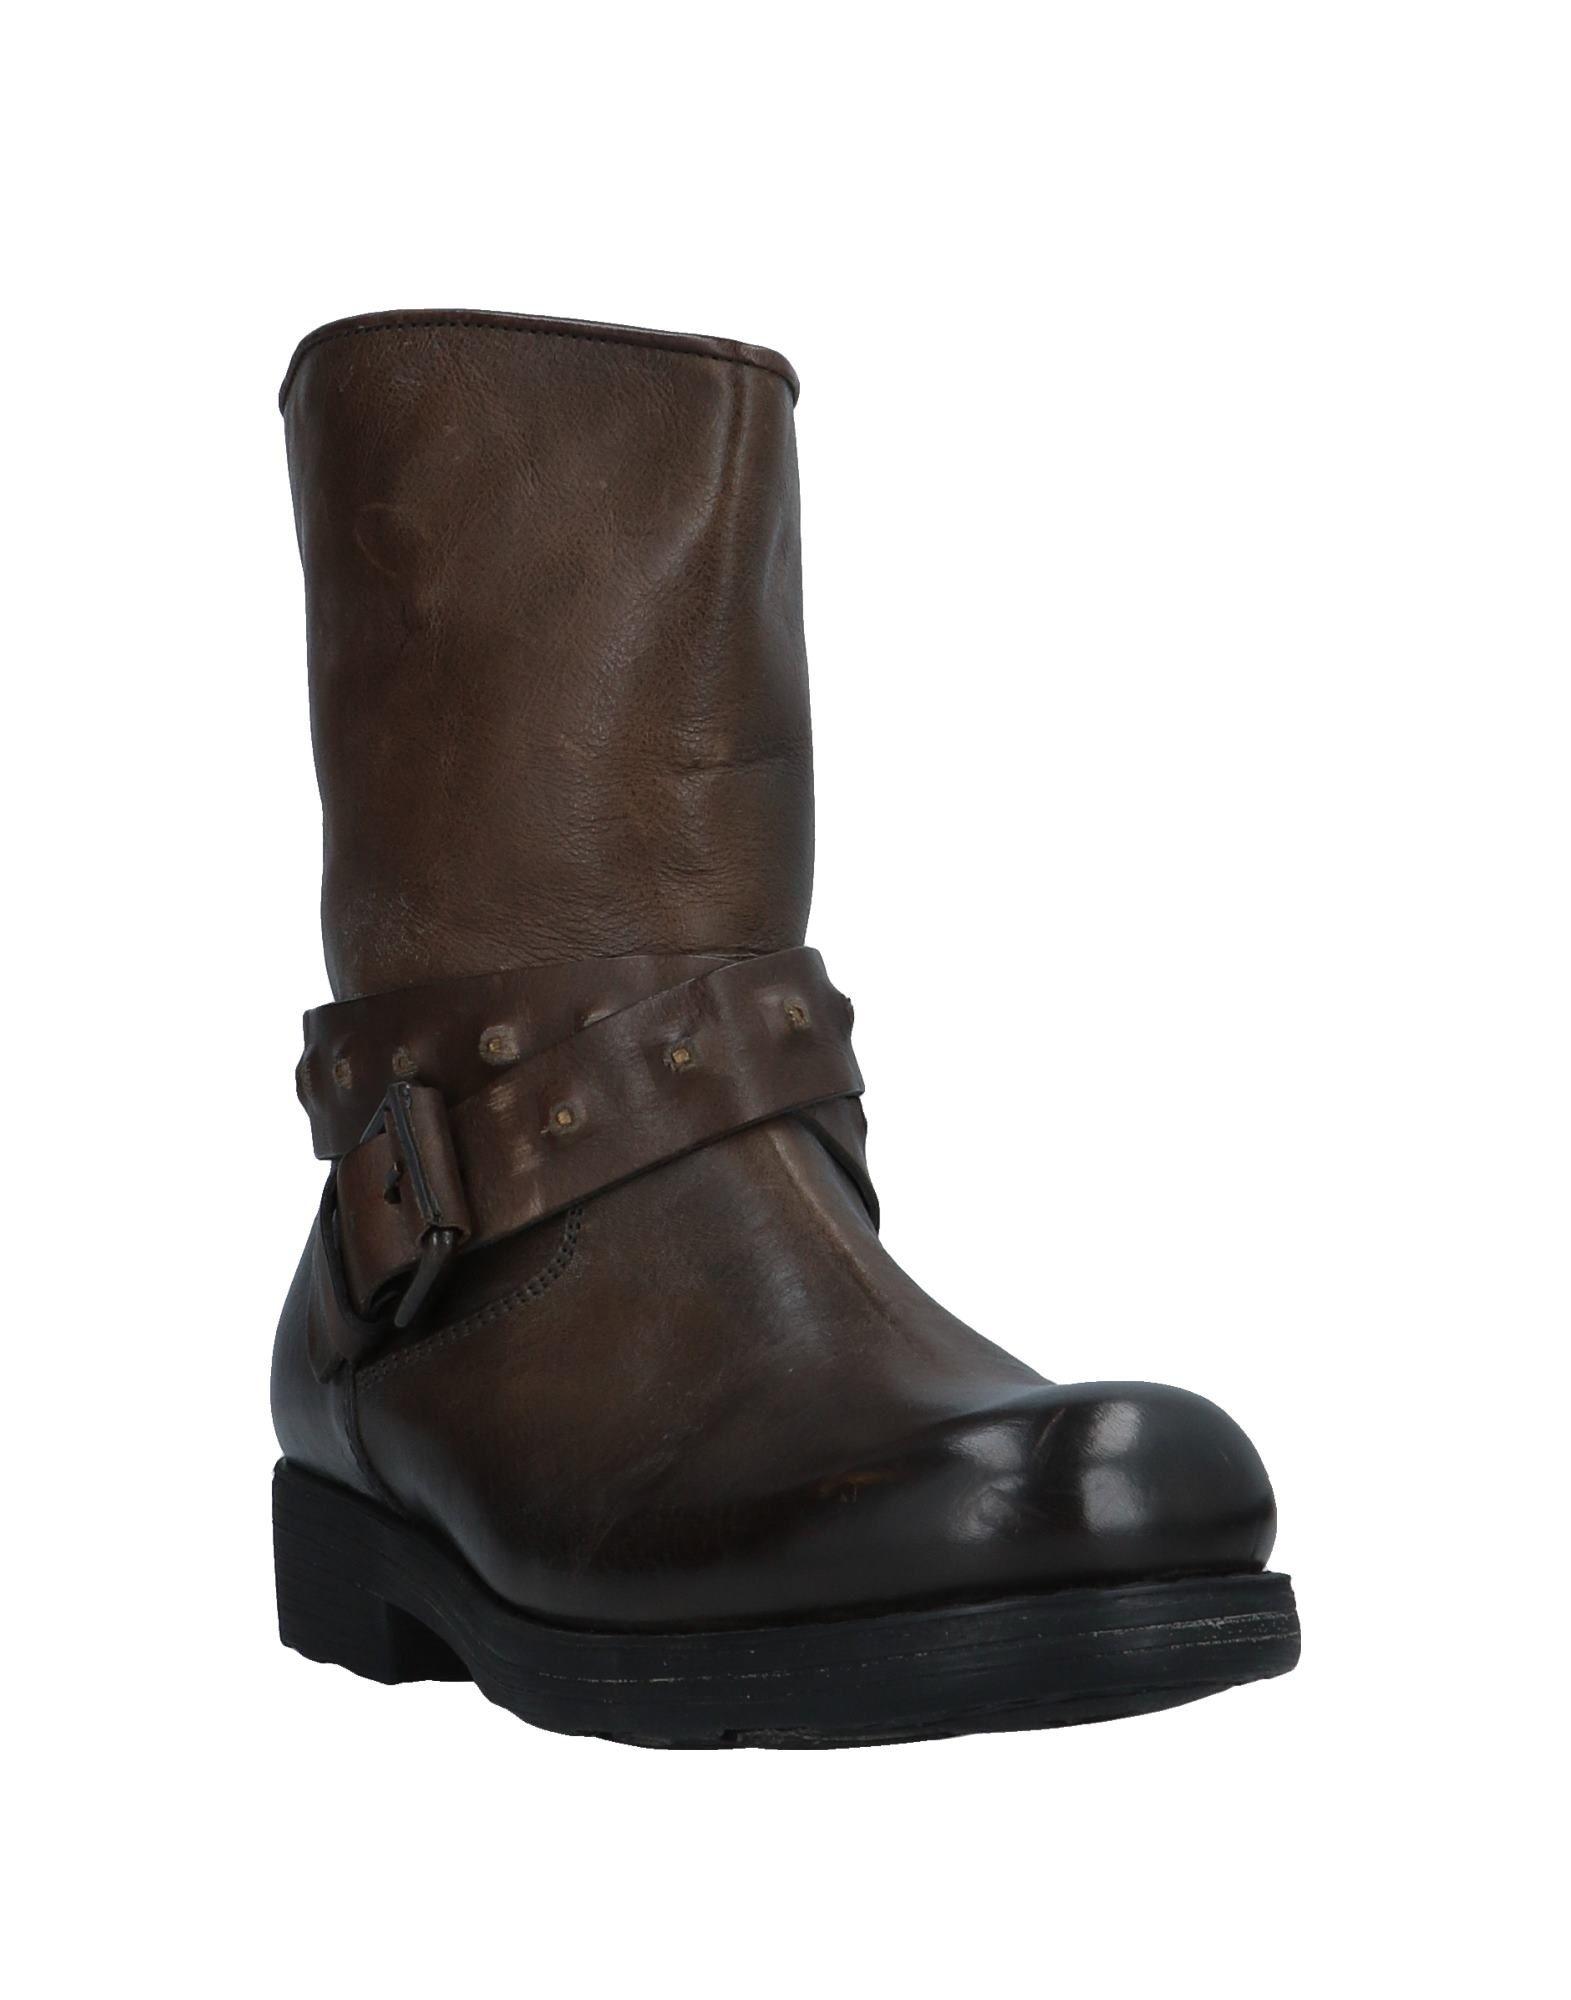 Stilvolle billige Schuhe O.X.S. Stiefelette Damen Damen Damen  11314764RG 715519